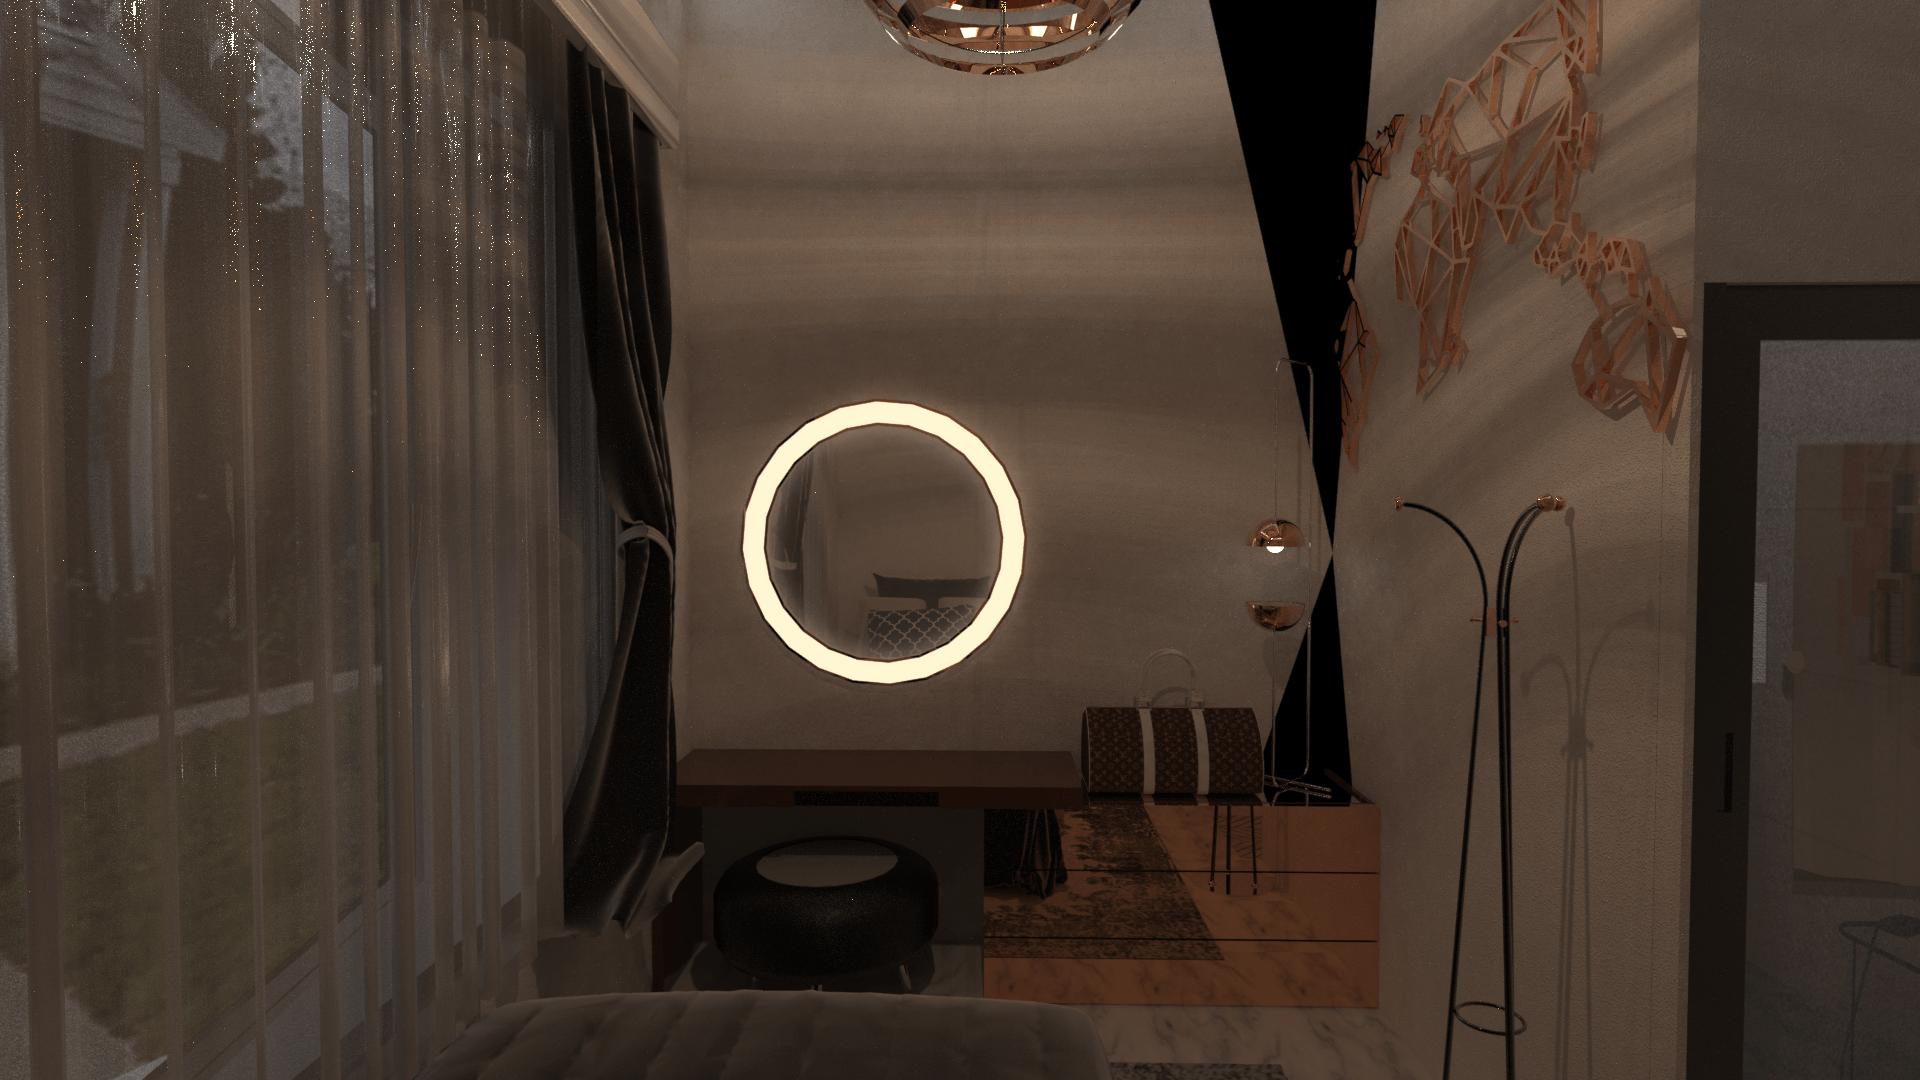 Jdcorp Redesign Living Room,kitchen, And Bedroom Mr.nasrial Bengkulu, Kota Bengkulu, Bengkulu, Indonesia Bengkulu, Kota Bengkulu, Bengkulu, Indonesia Jdcorp-Redesign-Living-Roomkitchen-And-Bedroom-Mrnasrial Modern  108500